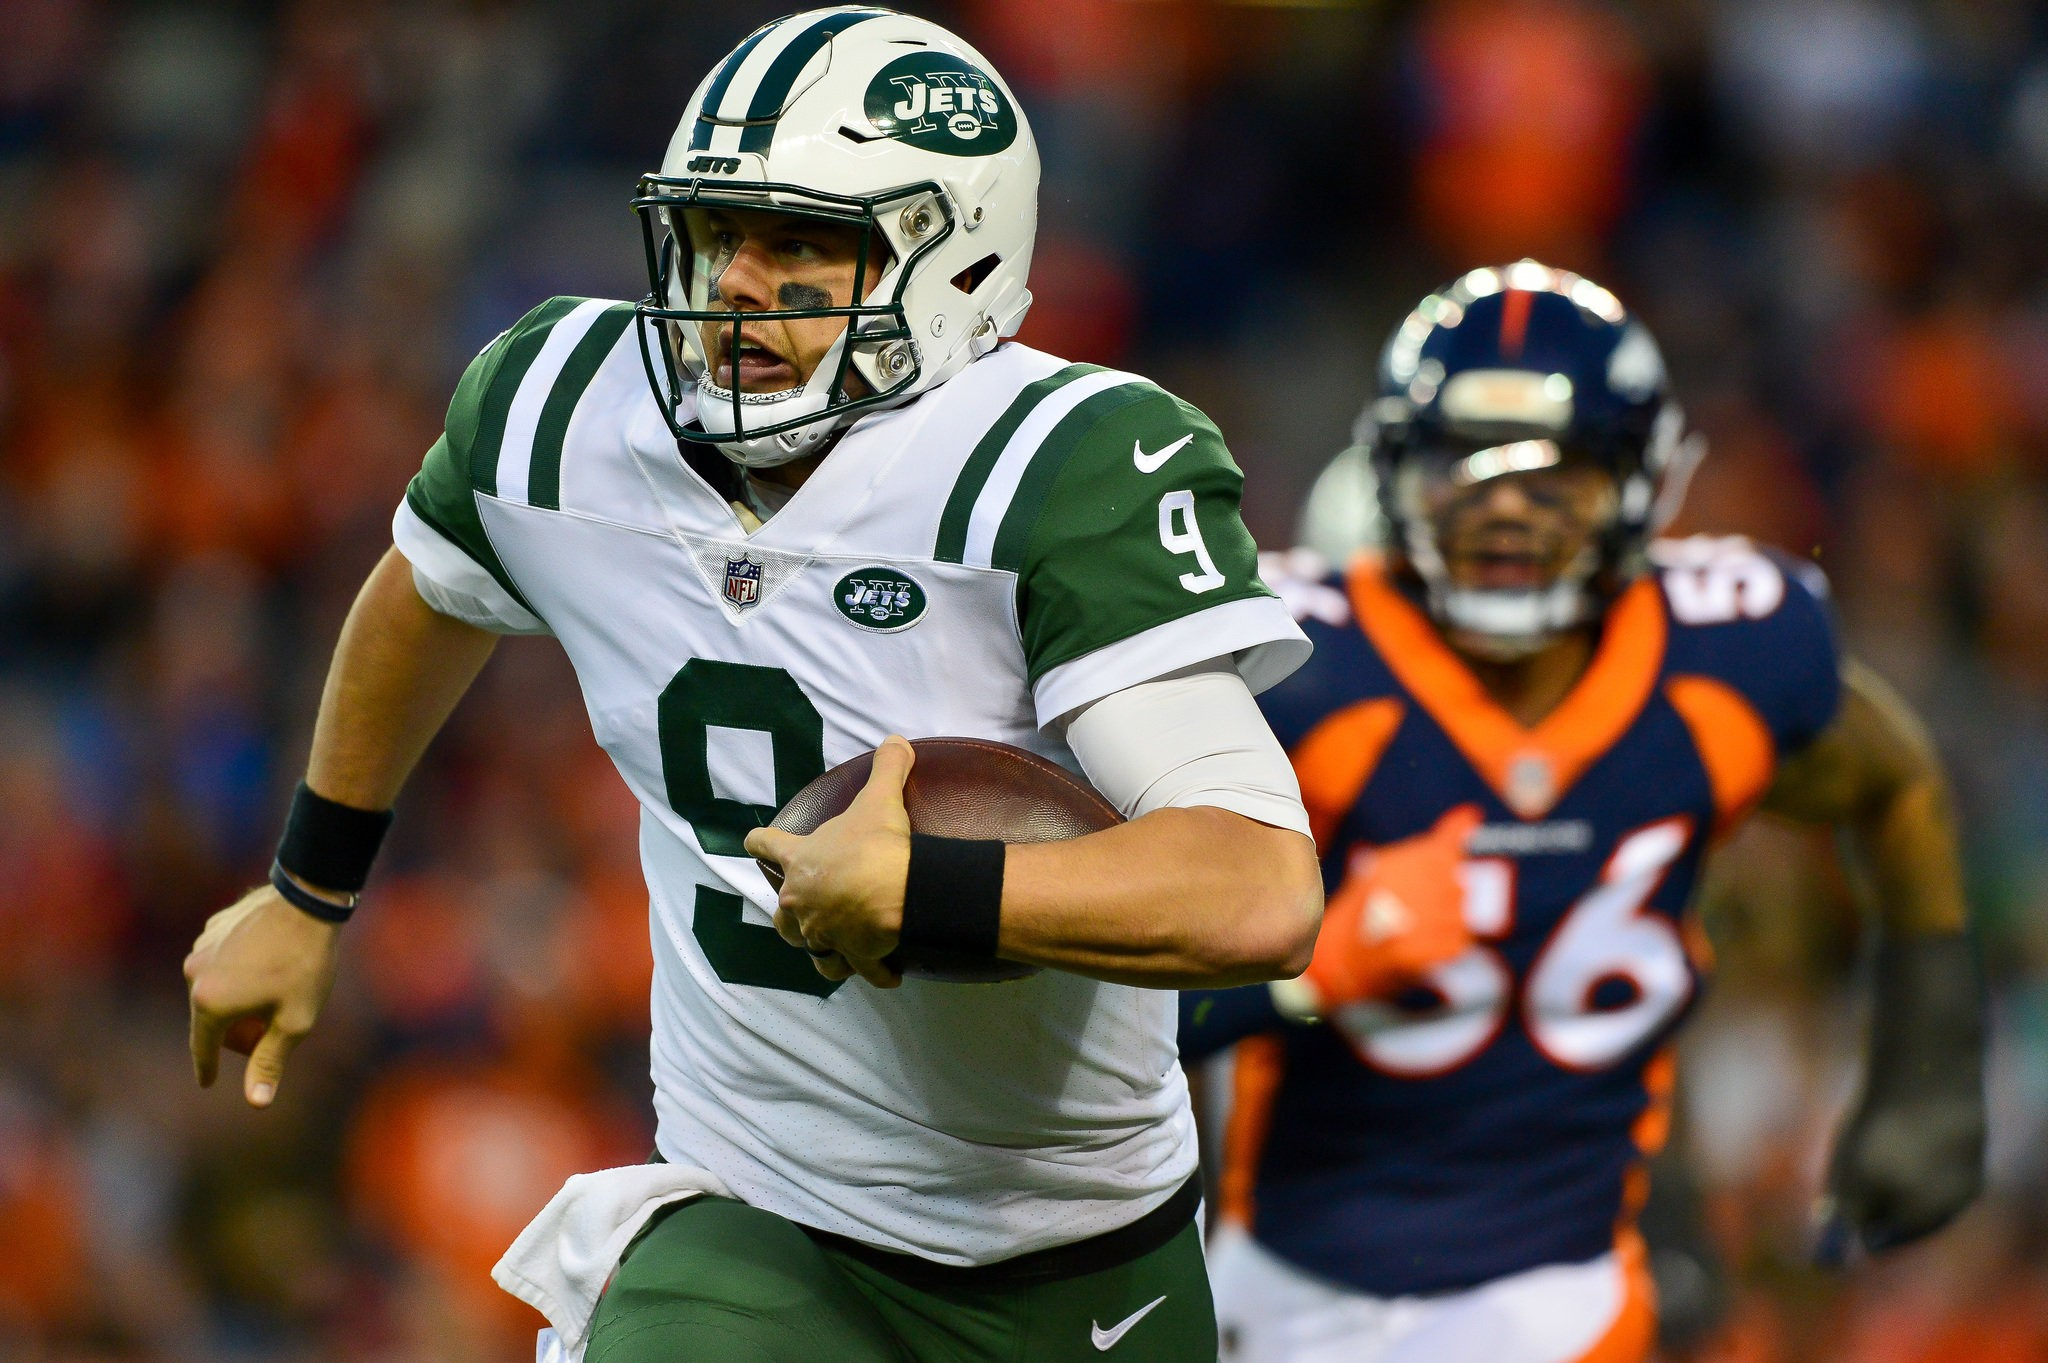 Jets' Bryce Petty 'ready' to start against Saints - nj.com